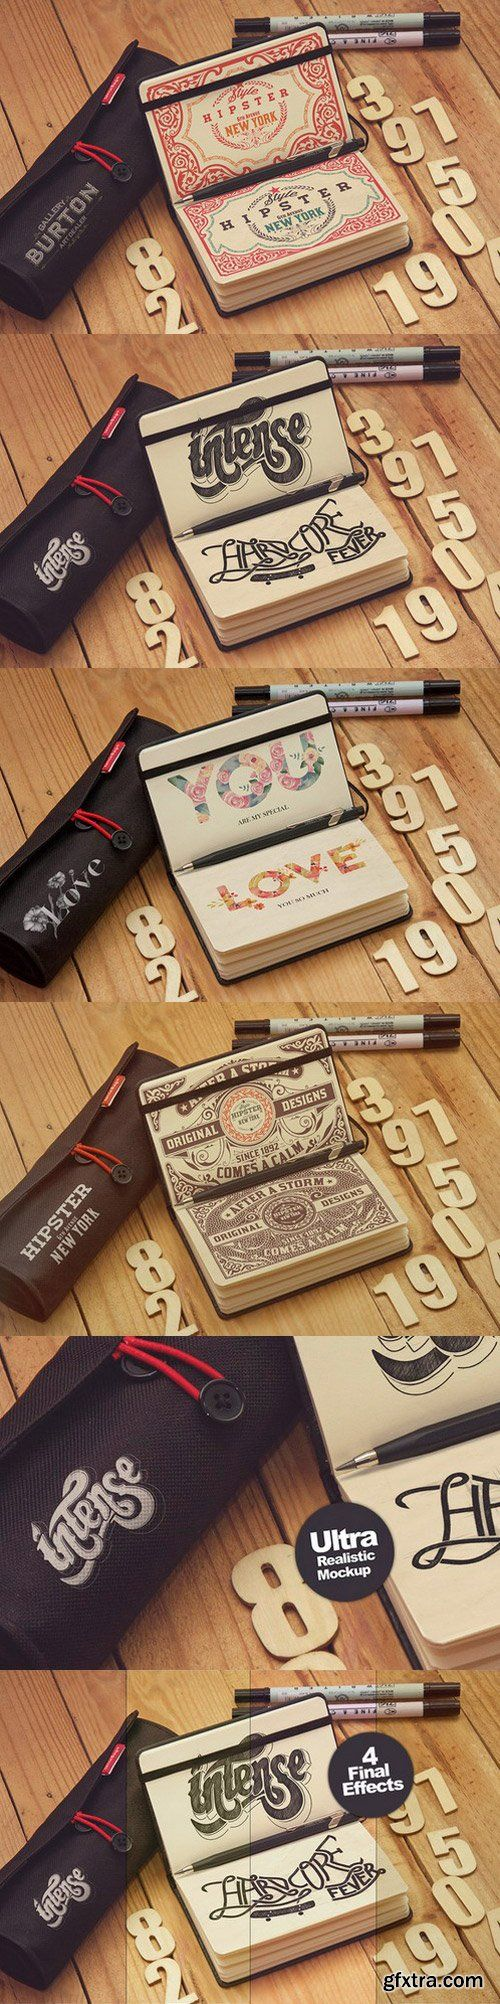 CM - Sketch Notebook Mockup 557161